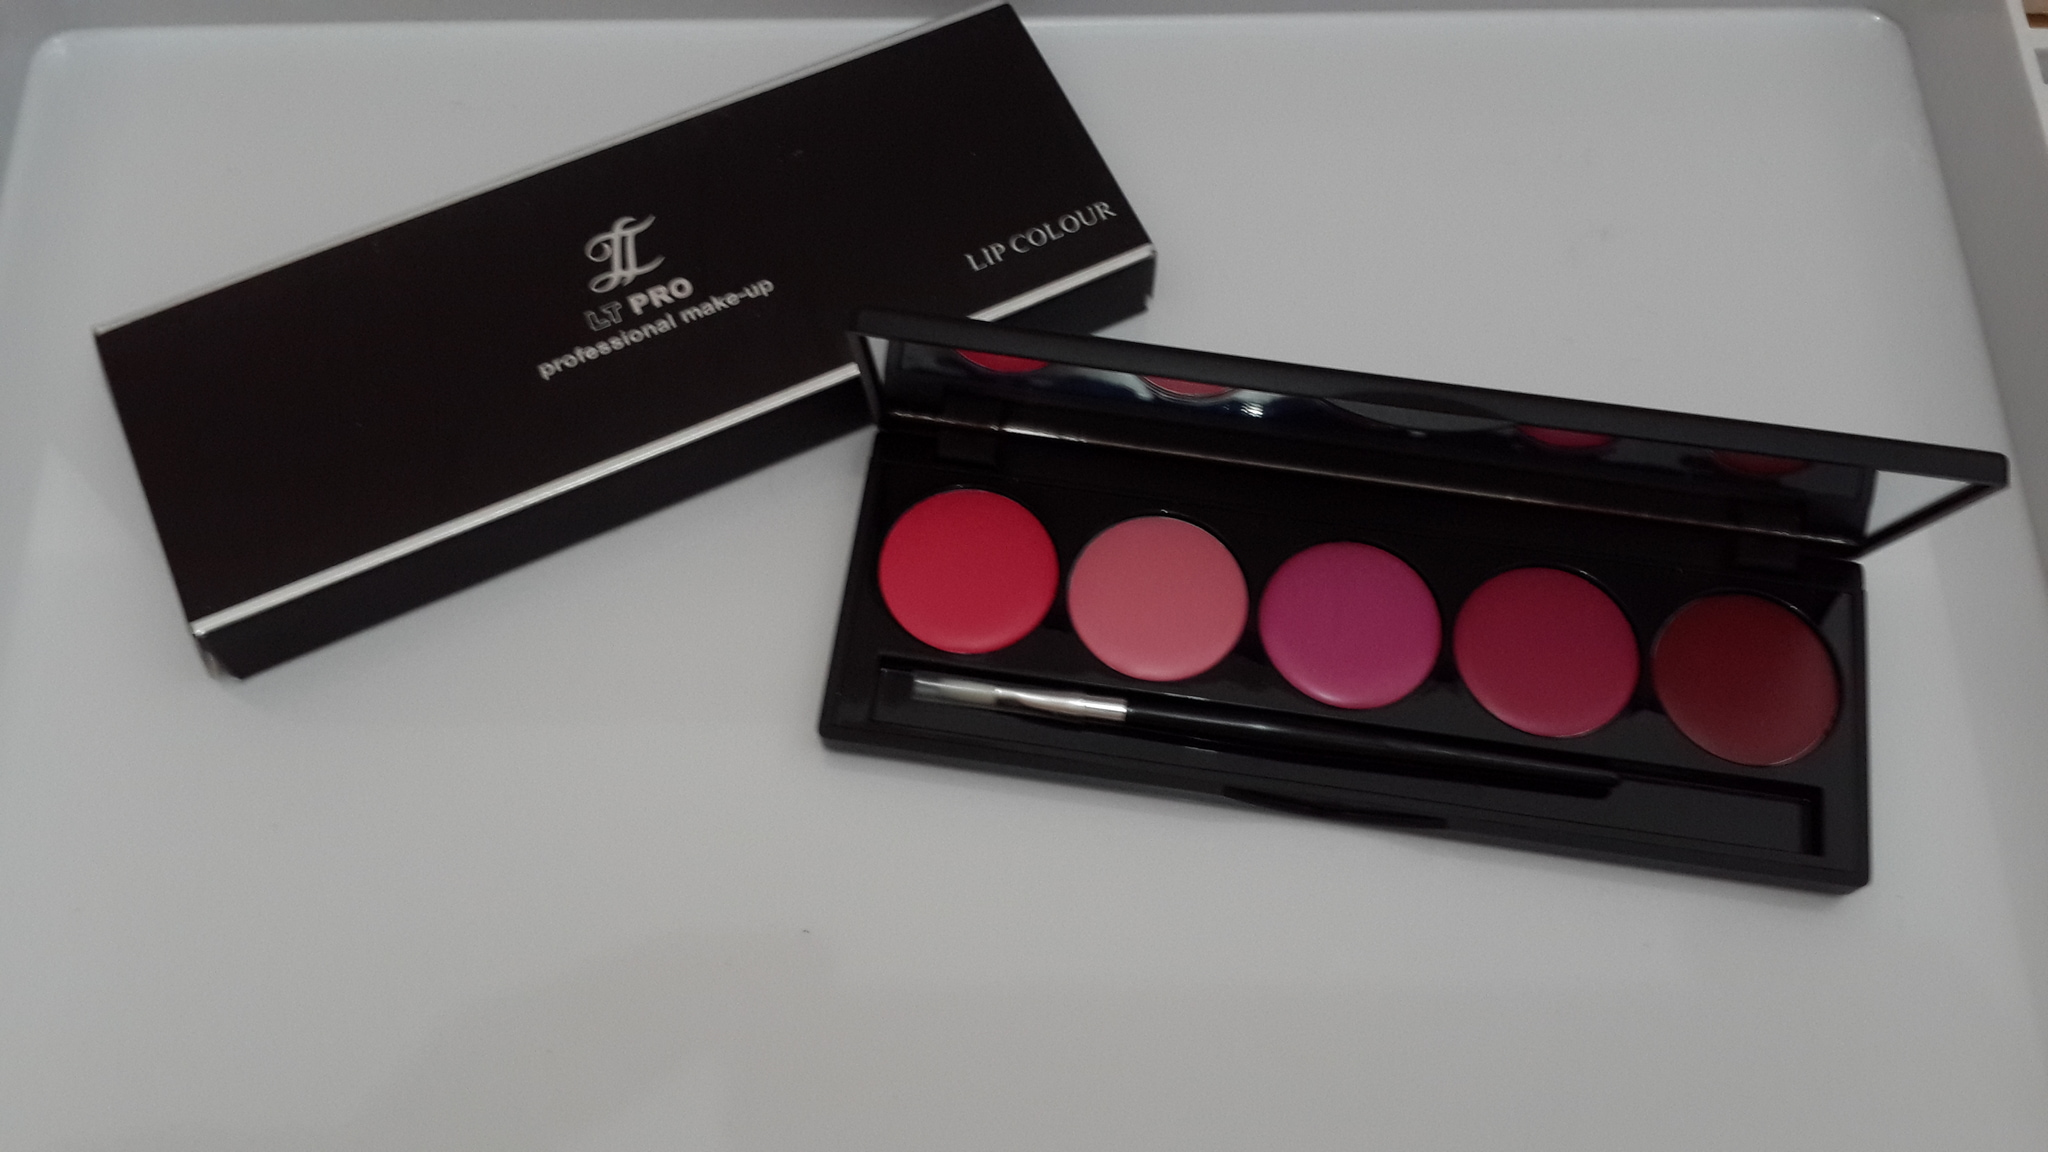 Jual LT Pro Lip Color 01 - sinaralam kosmetik | Tokopedia